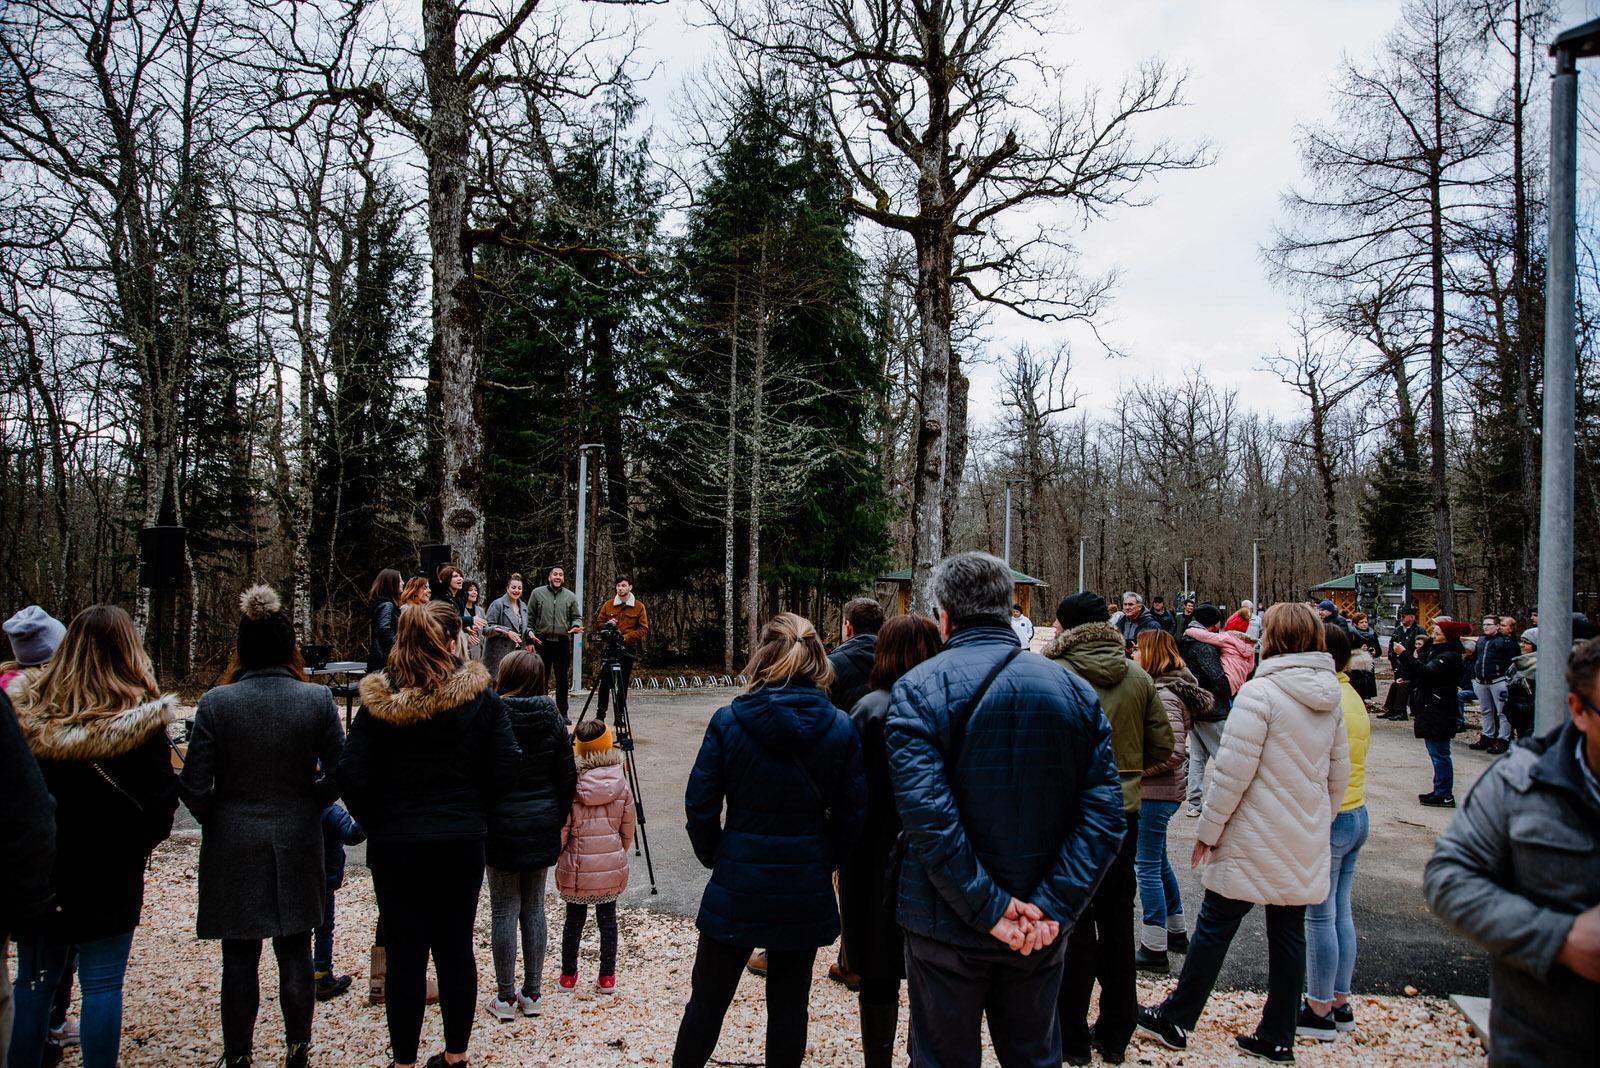 likaclub_gospić_park šuma jasikovac_projekt i video spot_2020 (27)